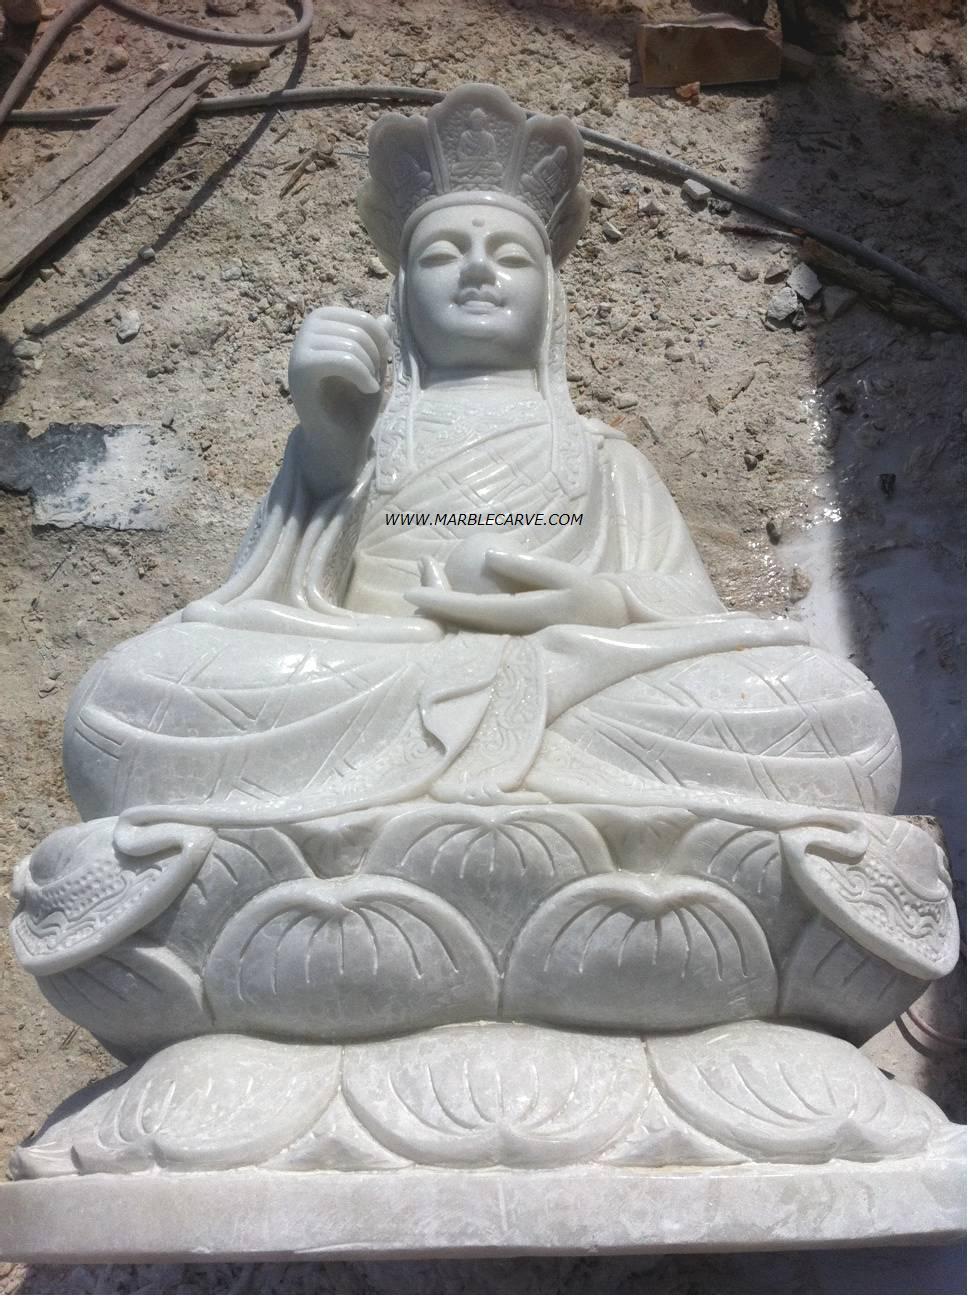 marble guan yin carving sculpture